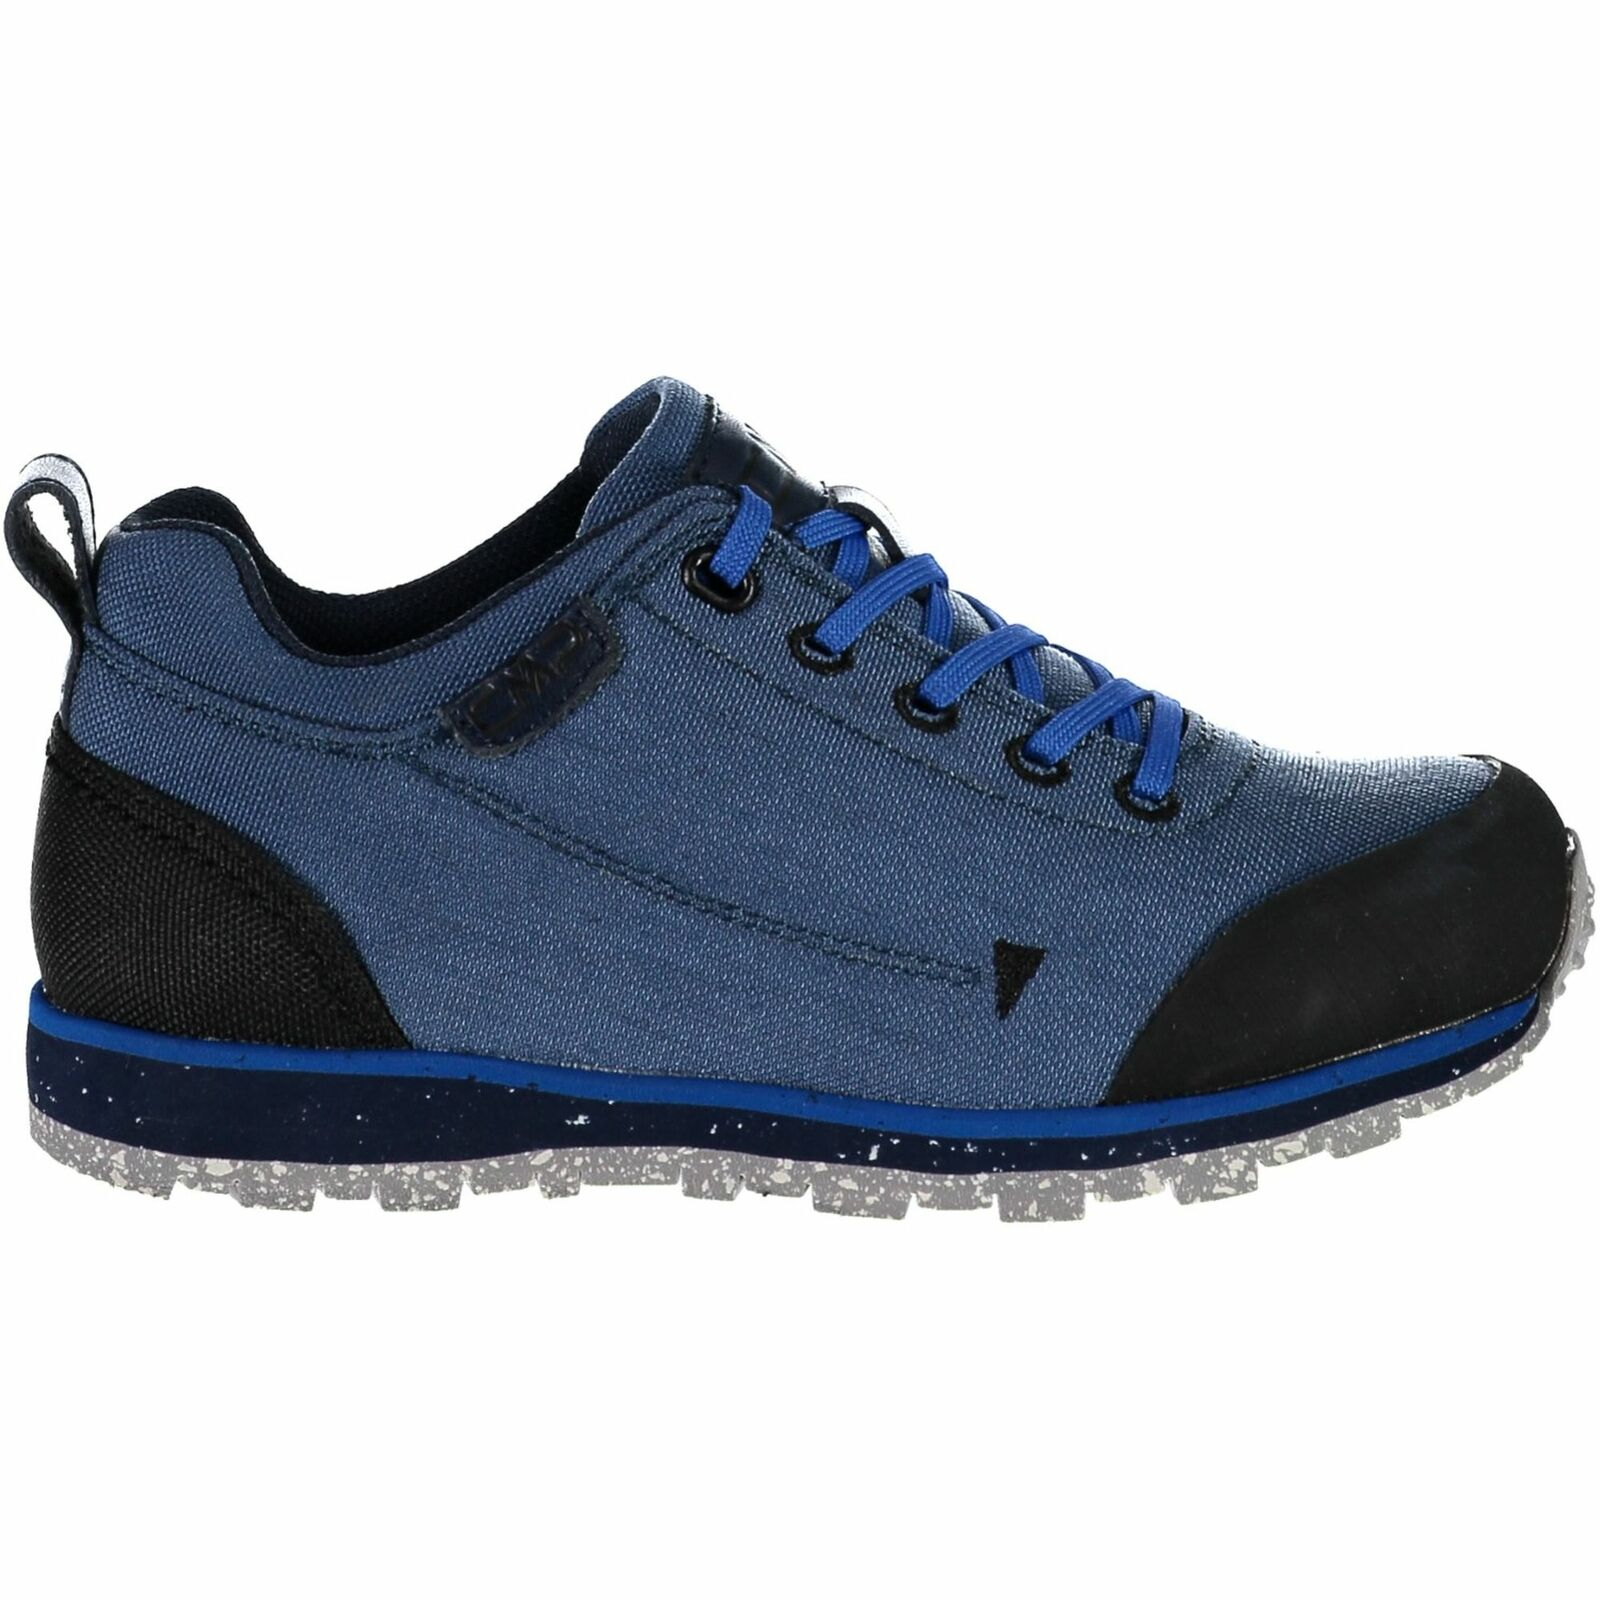 CMP walking boots shoes leisure kids  Elettra low cordura hiking  honest service